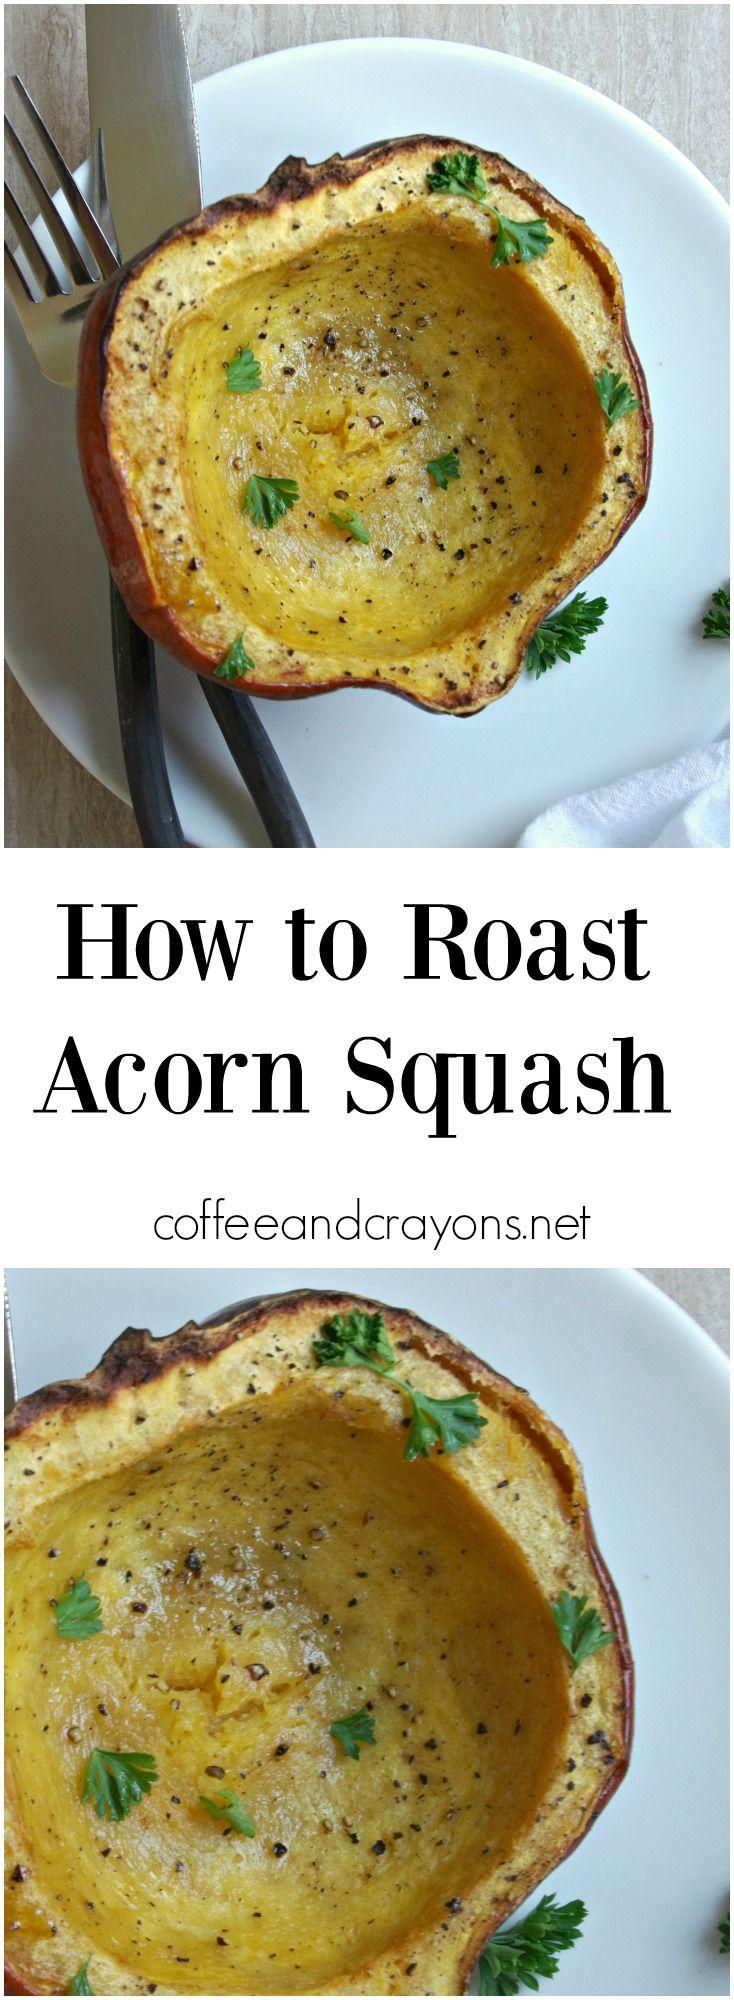 How to roast Acorn Squash. So easy!